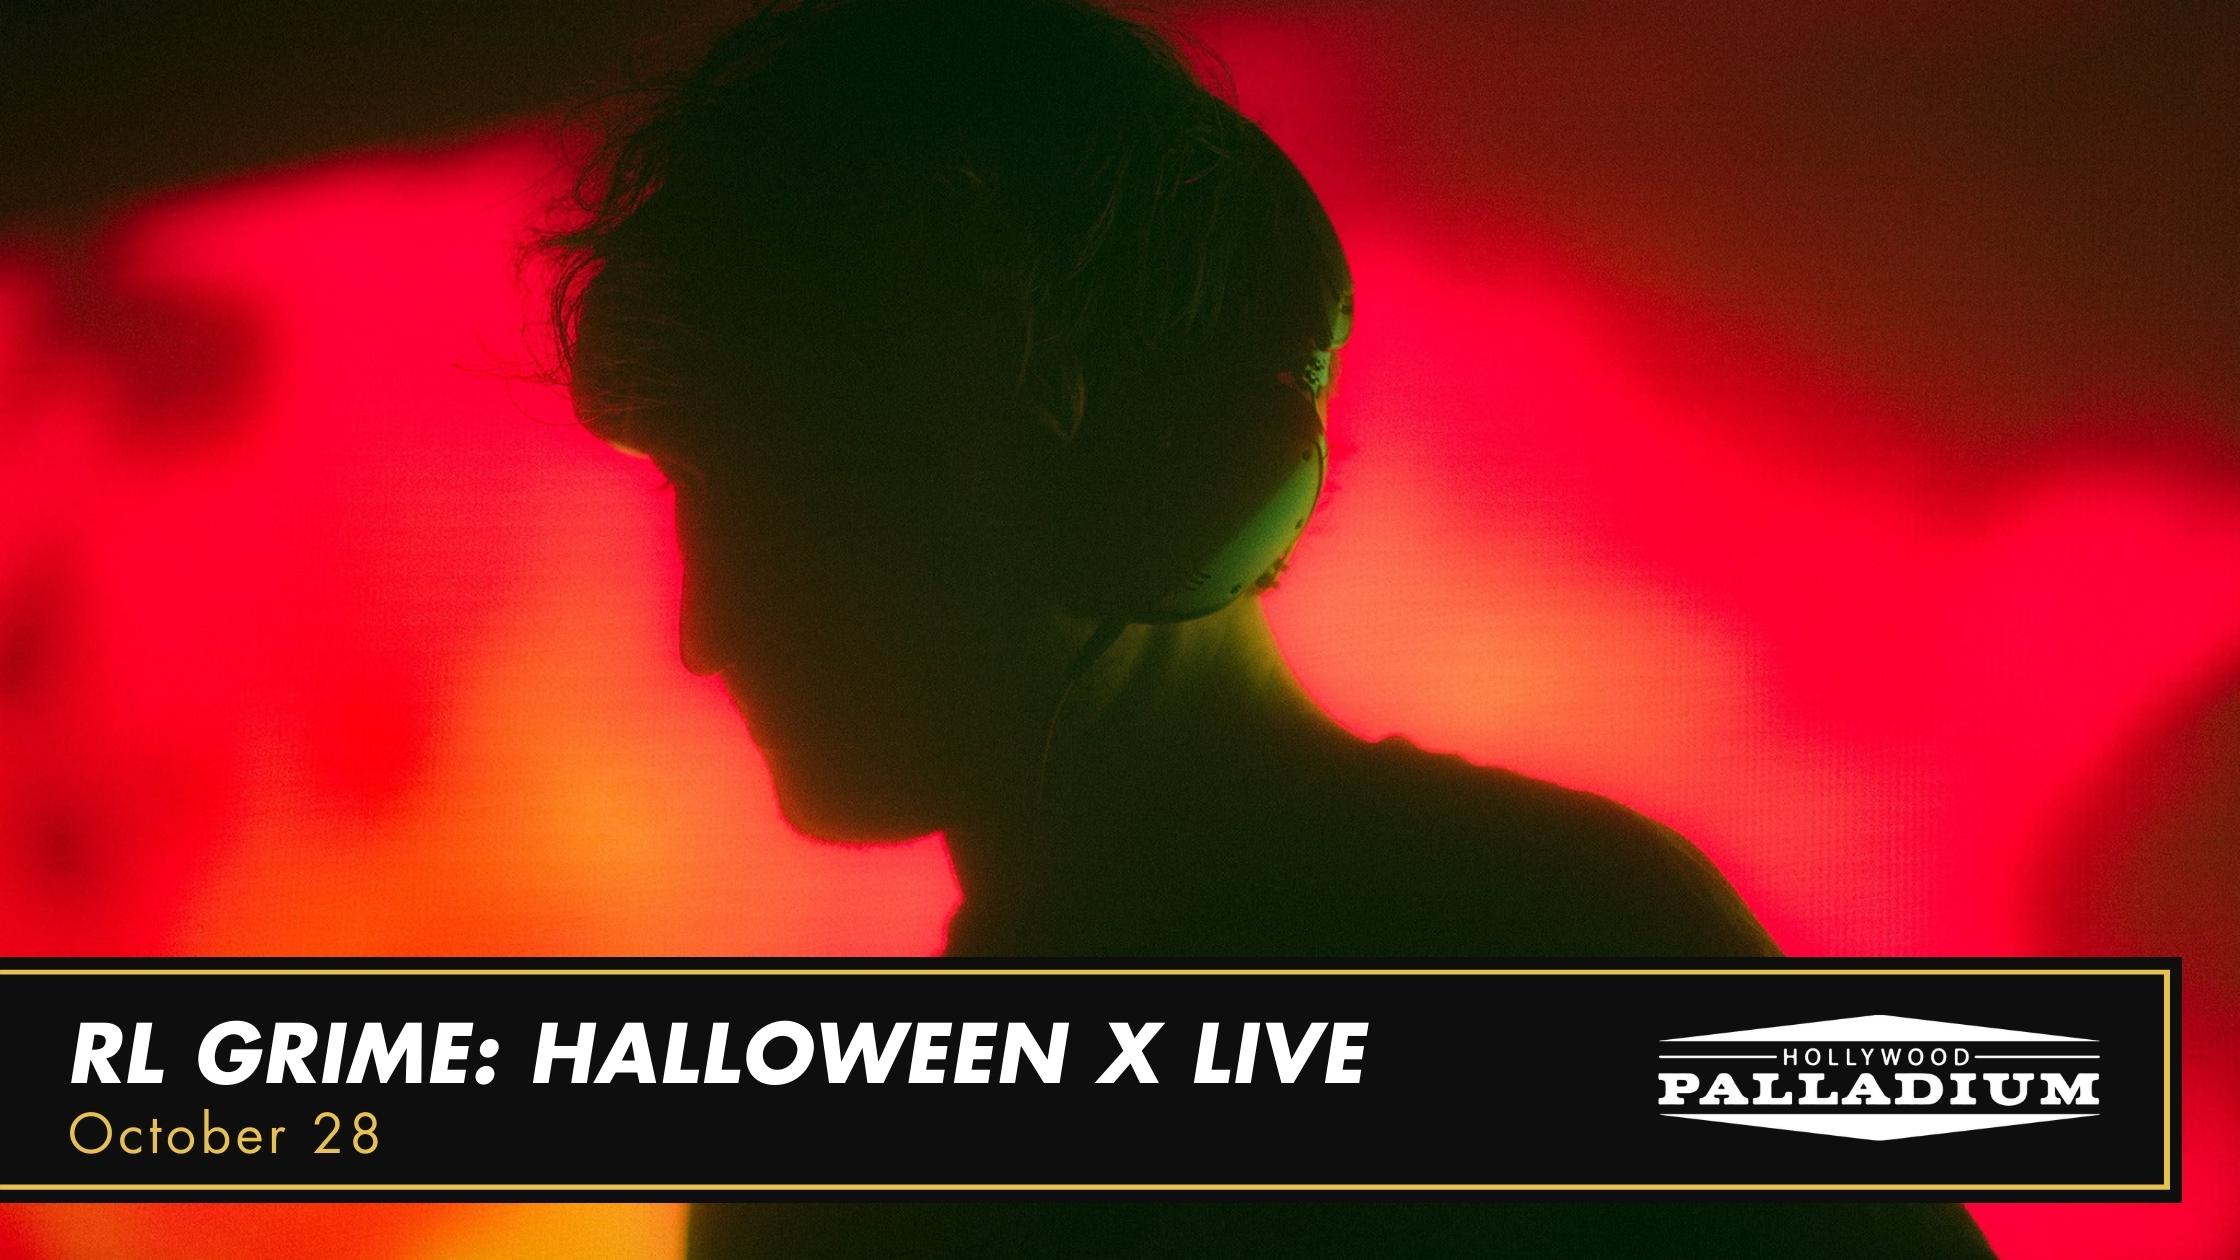 RL Grime: Halloween X Live At The Palladium